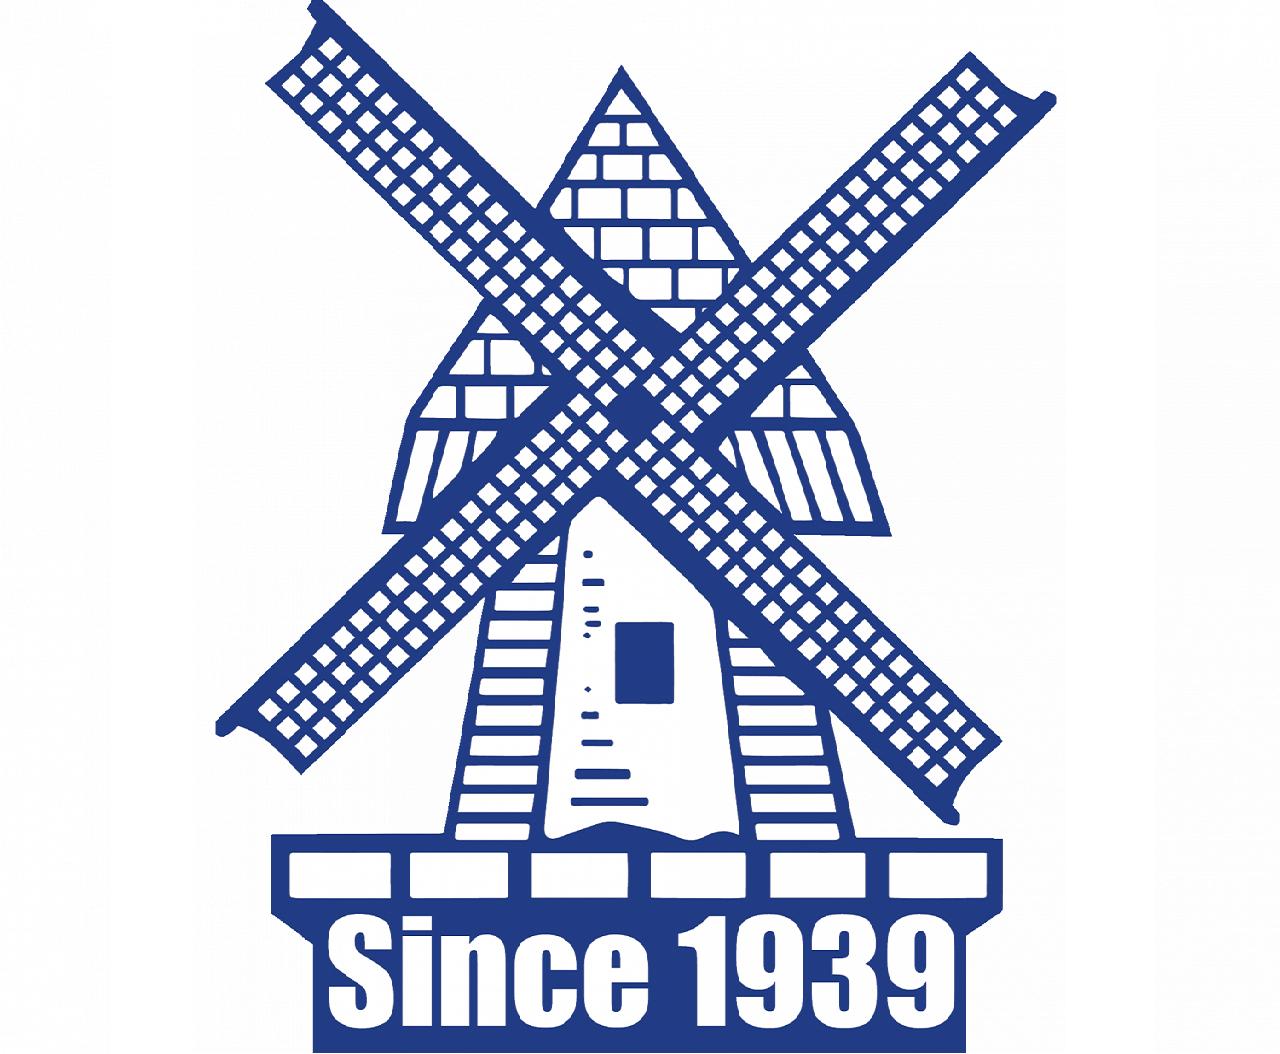 cummins isx price 500 00 [ 1280 x 956 Pixel ]